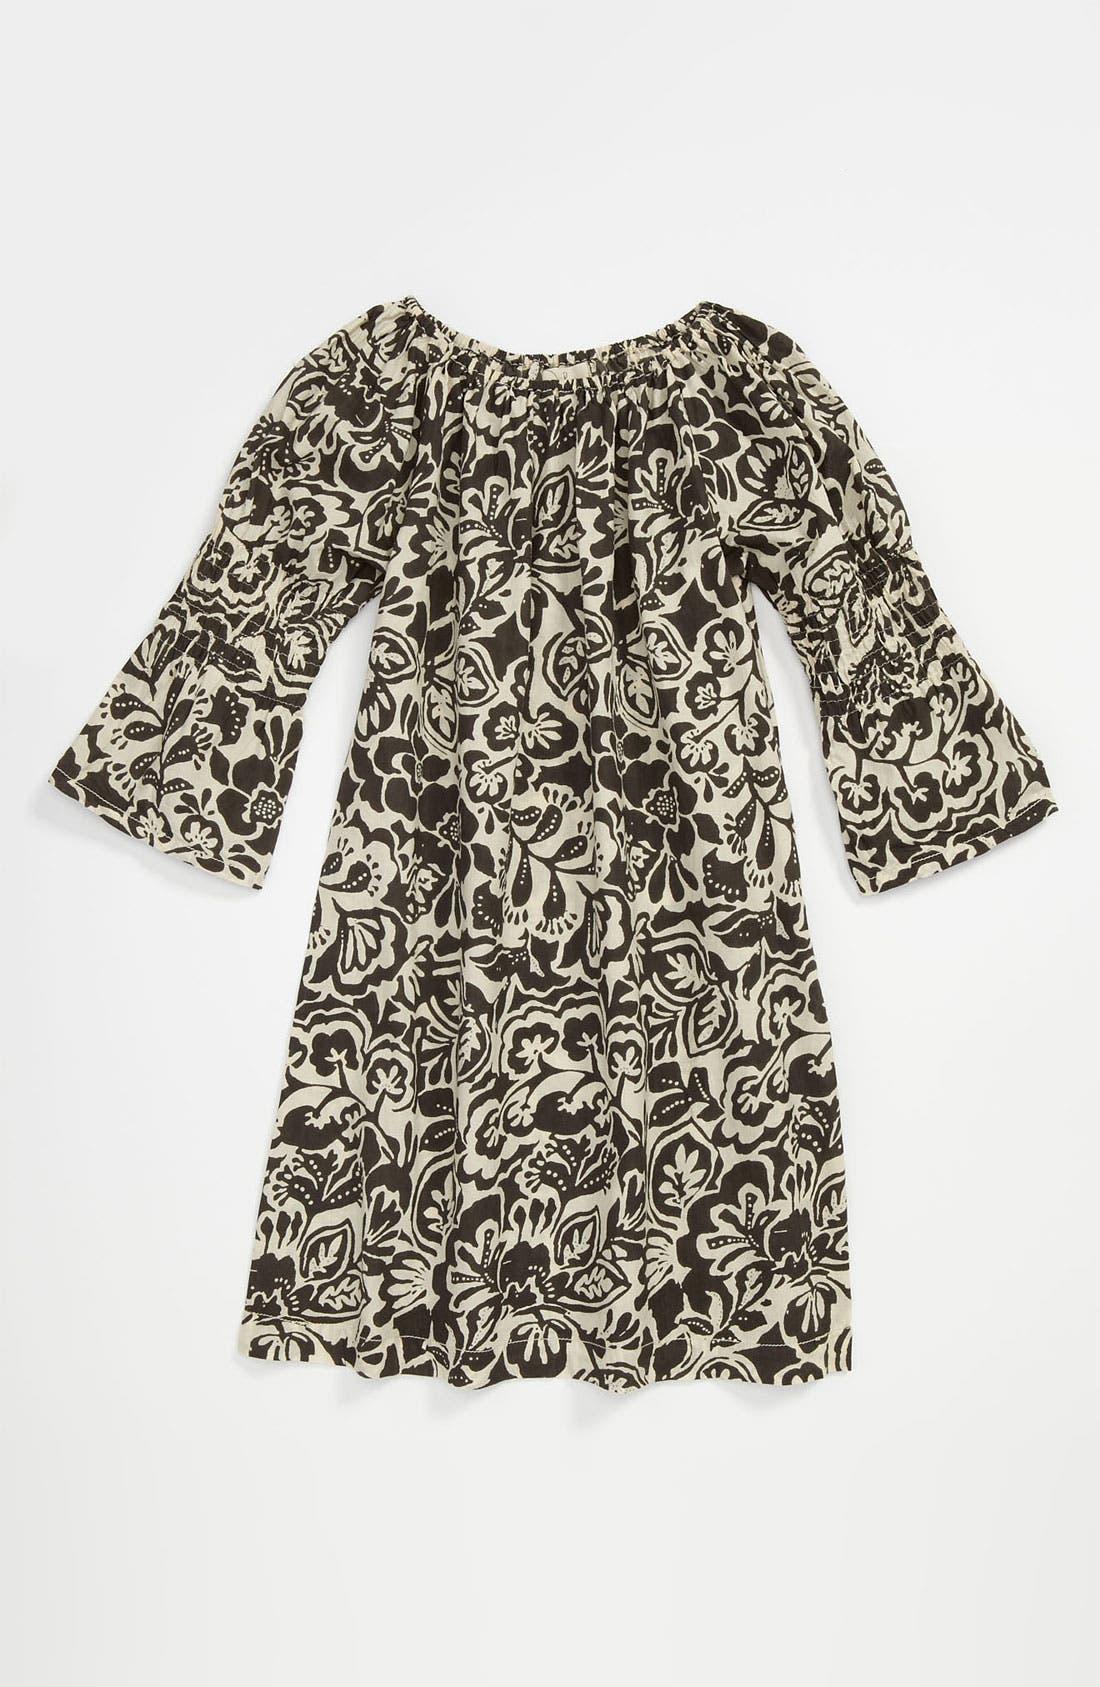 Alternate Image 1 Selected - Peek 'Simona' Dress (Big Girls)